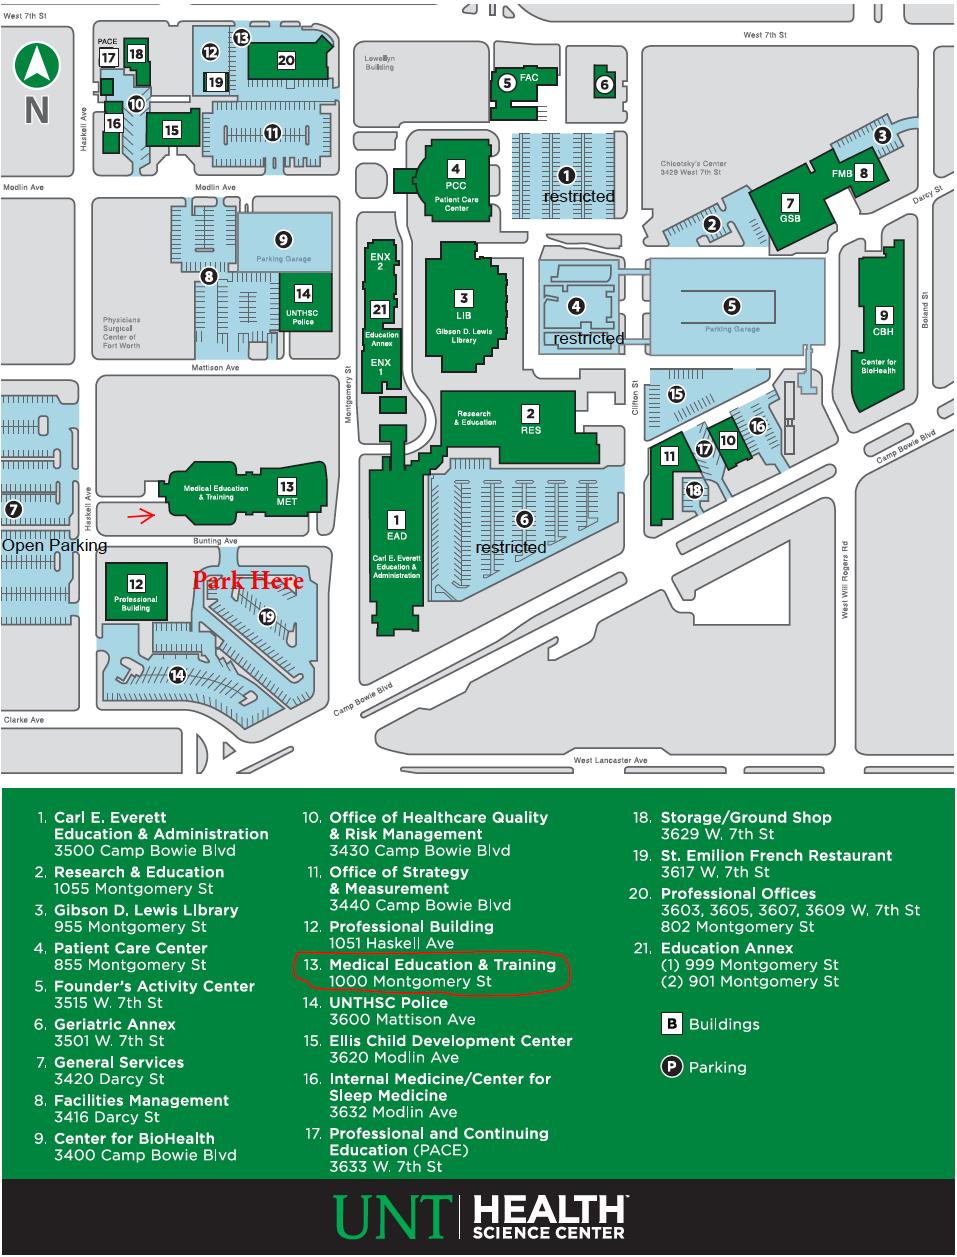 map of unt campus Unt Campus Map Met Medical Education Training Ensigntherapy Com map of unt campus